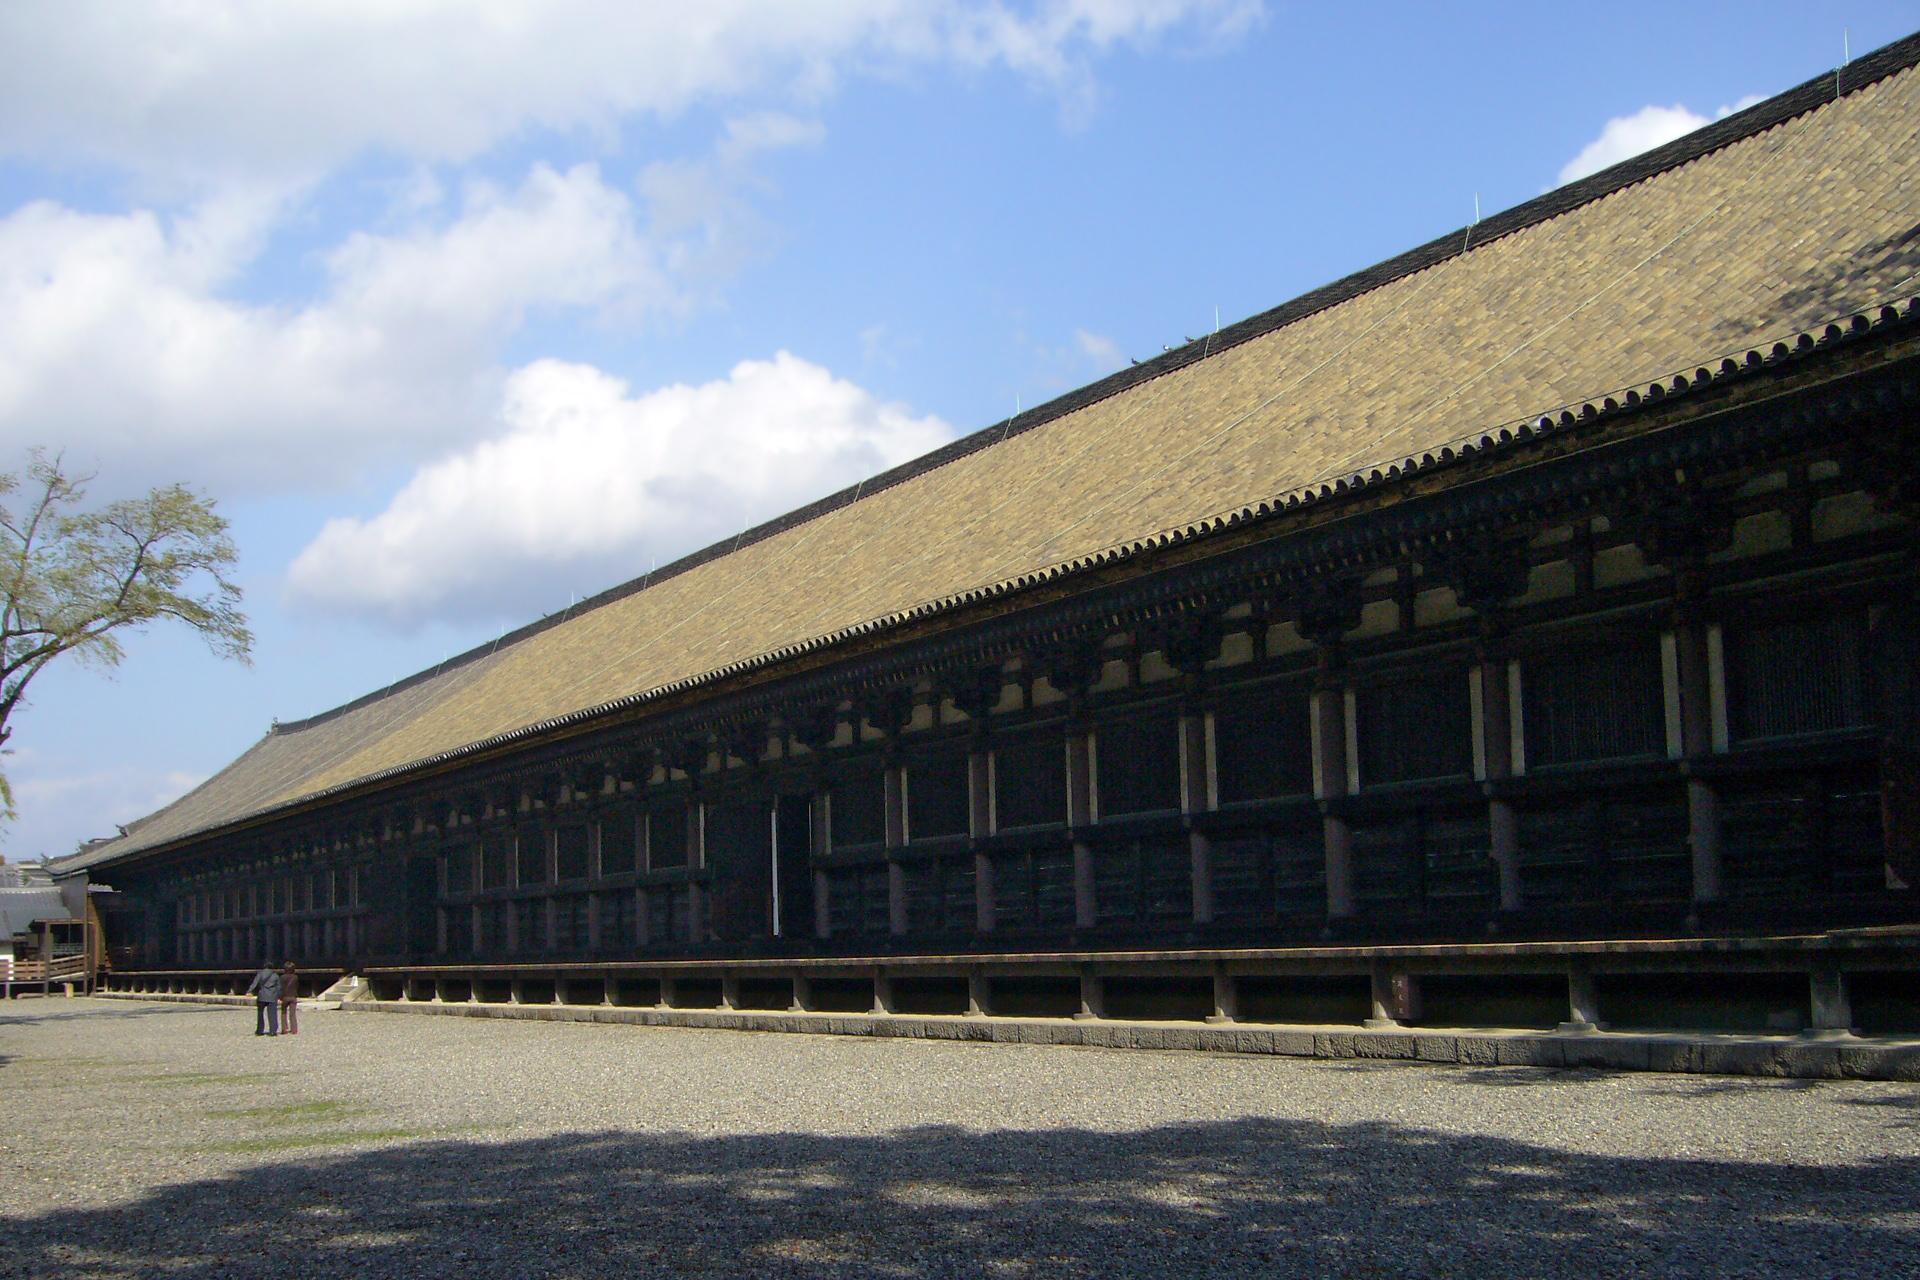 http://upload.wikimedia.org/wikipedia/commons/f/f0/Sanjusangendo_temple01s1408.jpg